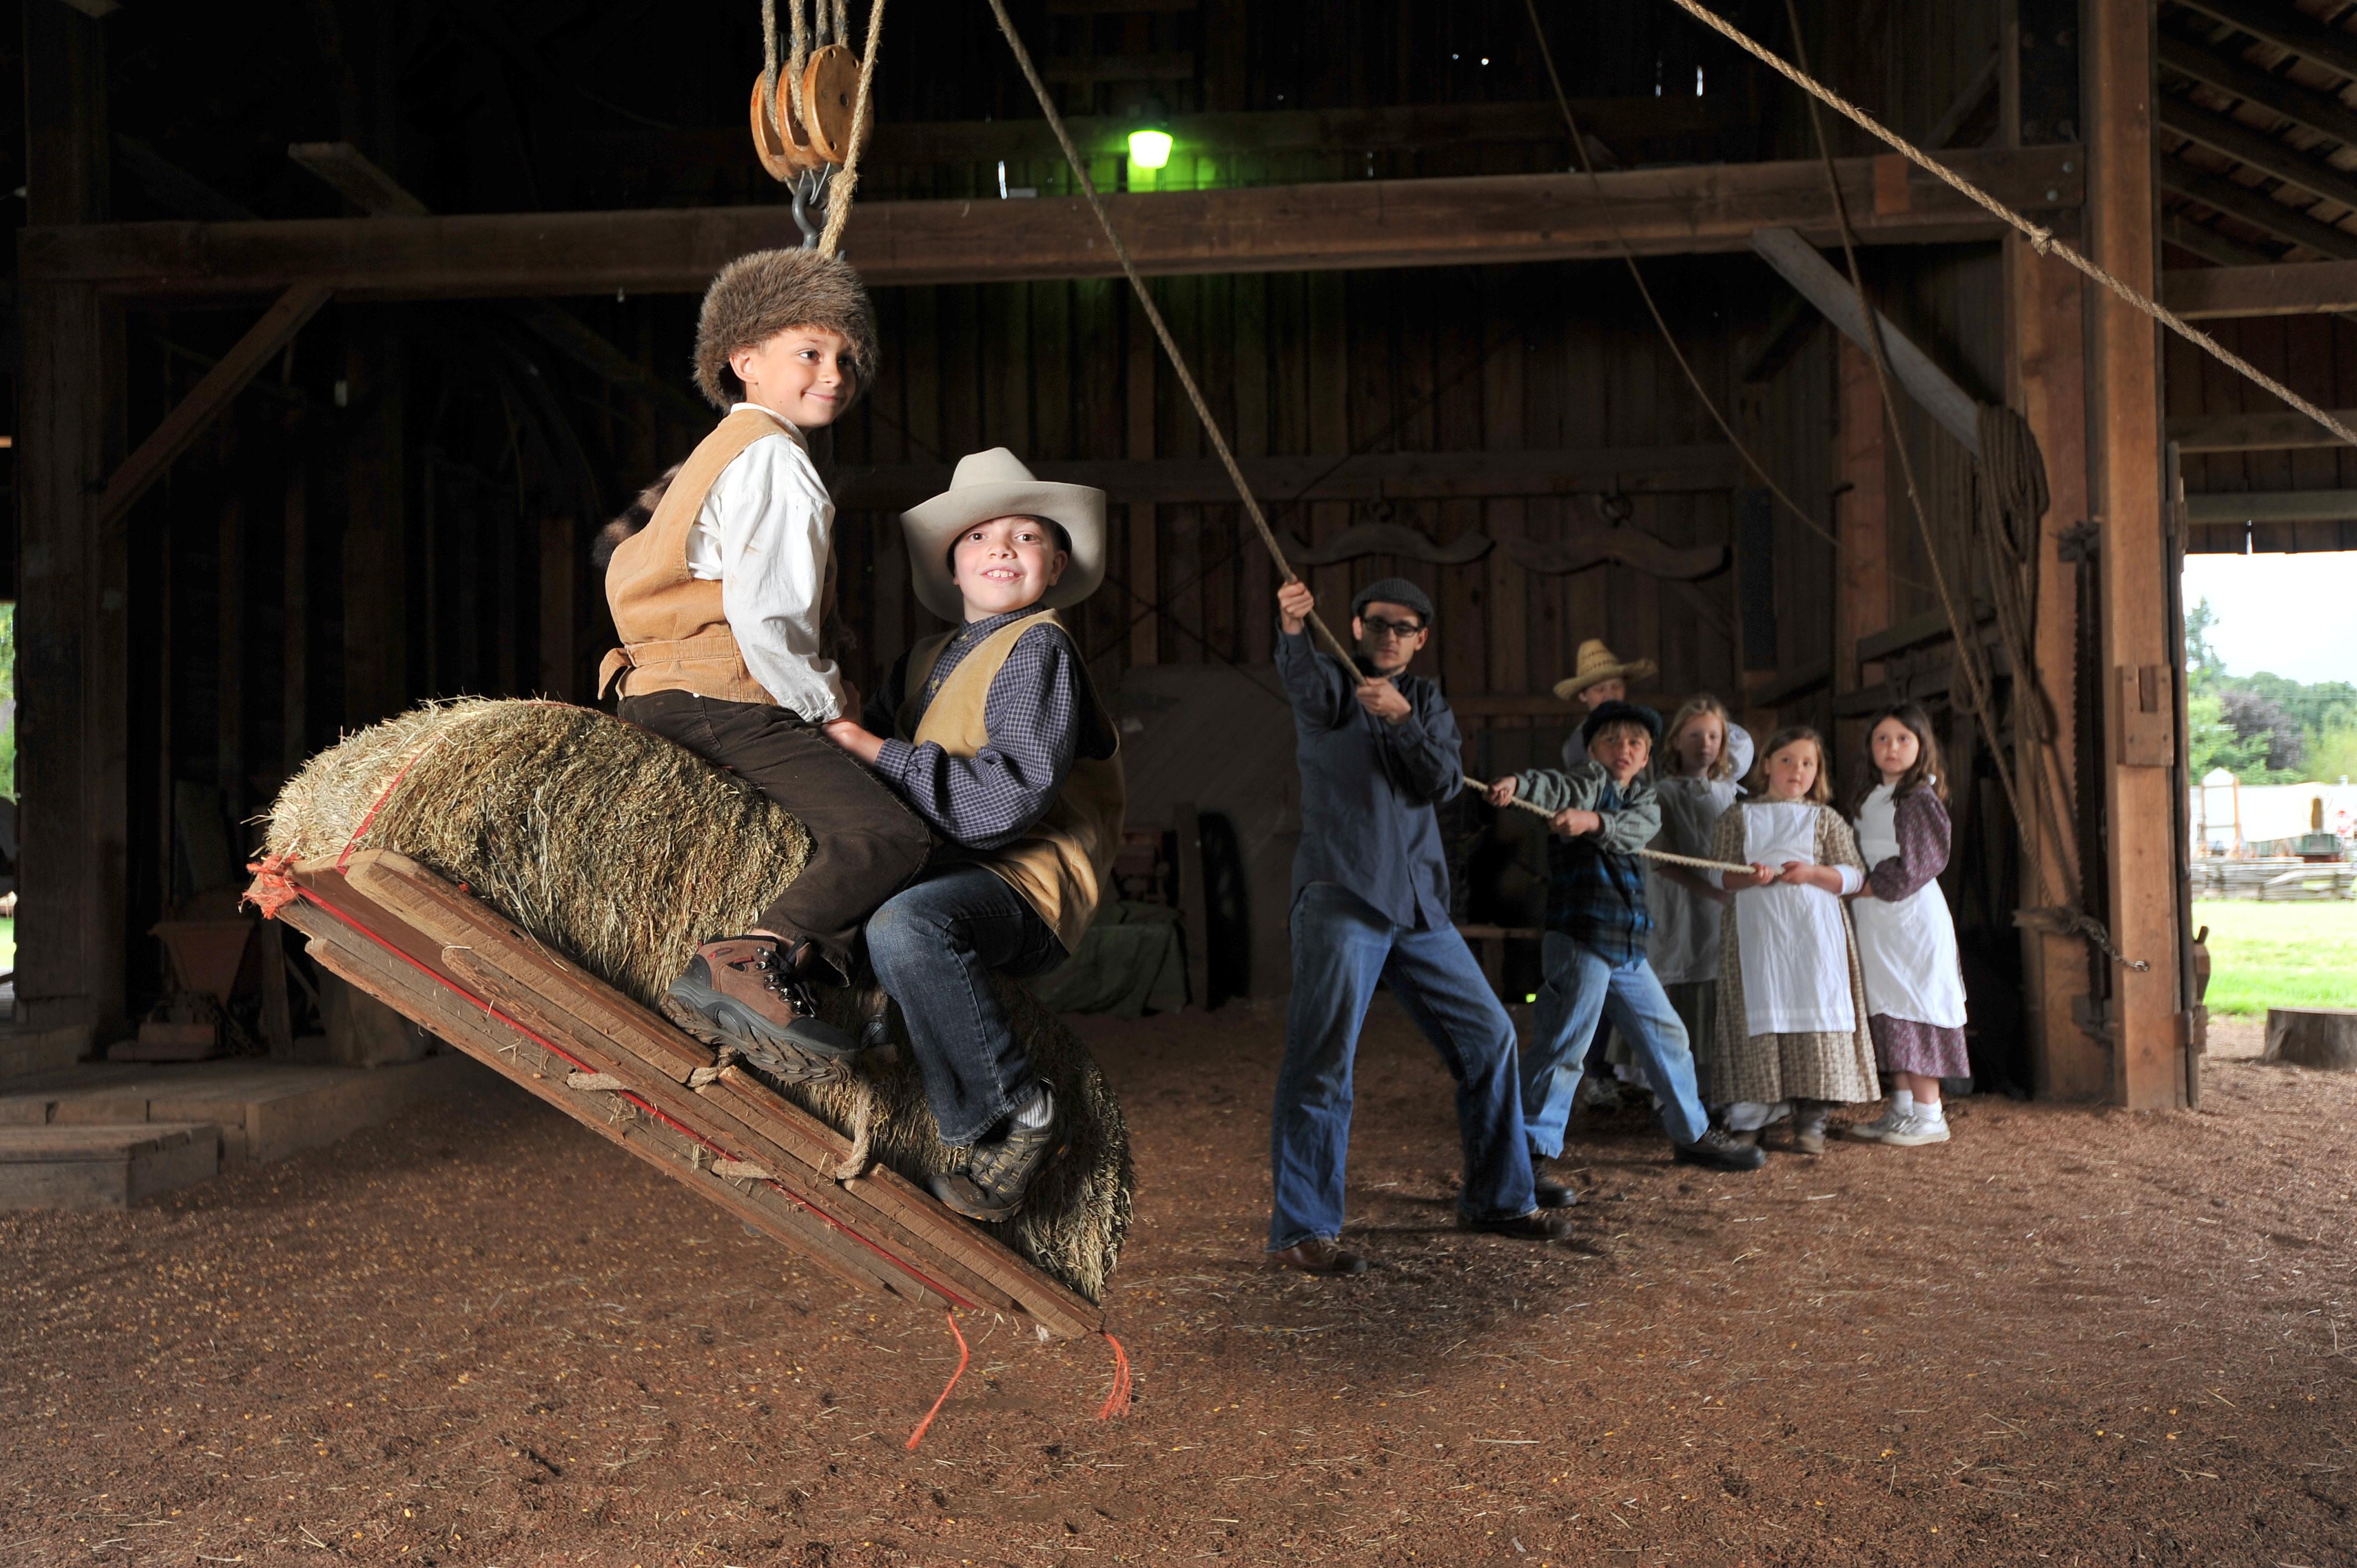 Philip Foster Farm Boys on Hay Bale Swing